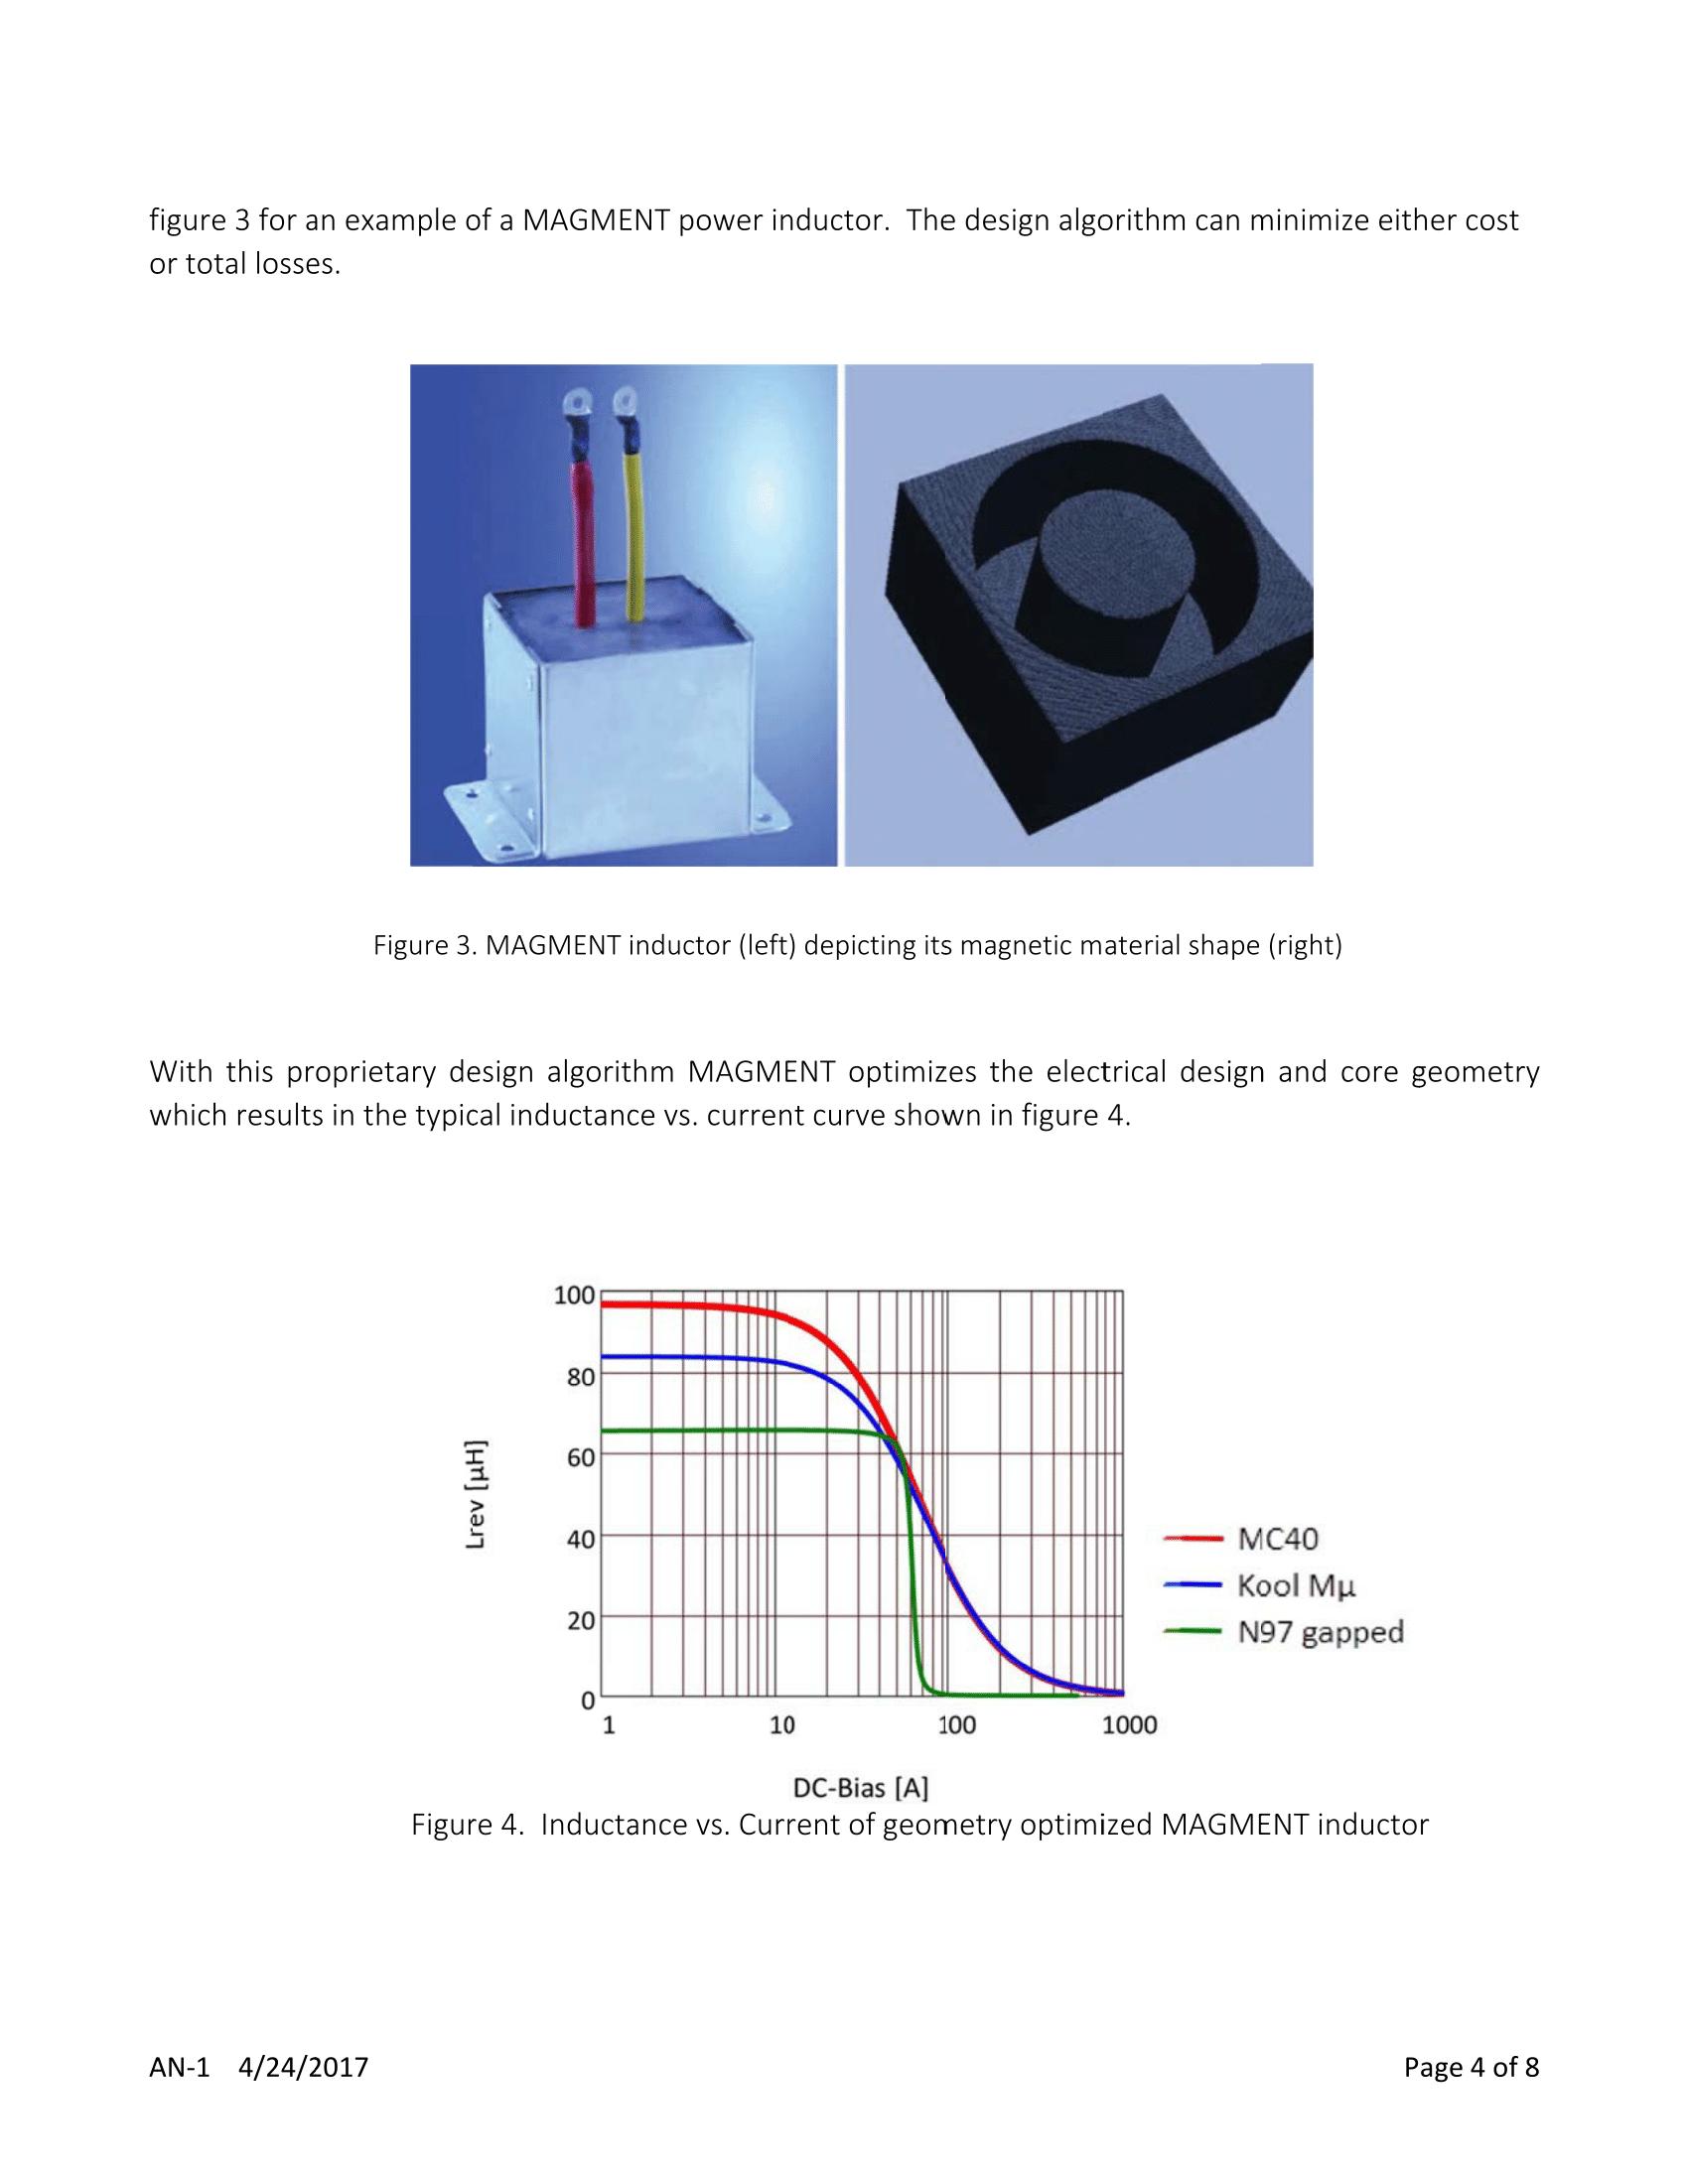 Breakthrough_in_Power_Magnetics_Materials-4.png